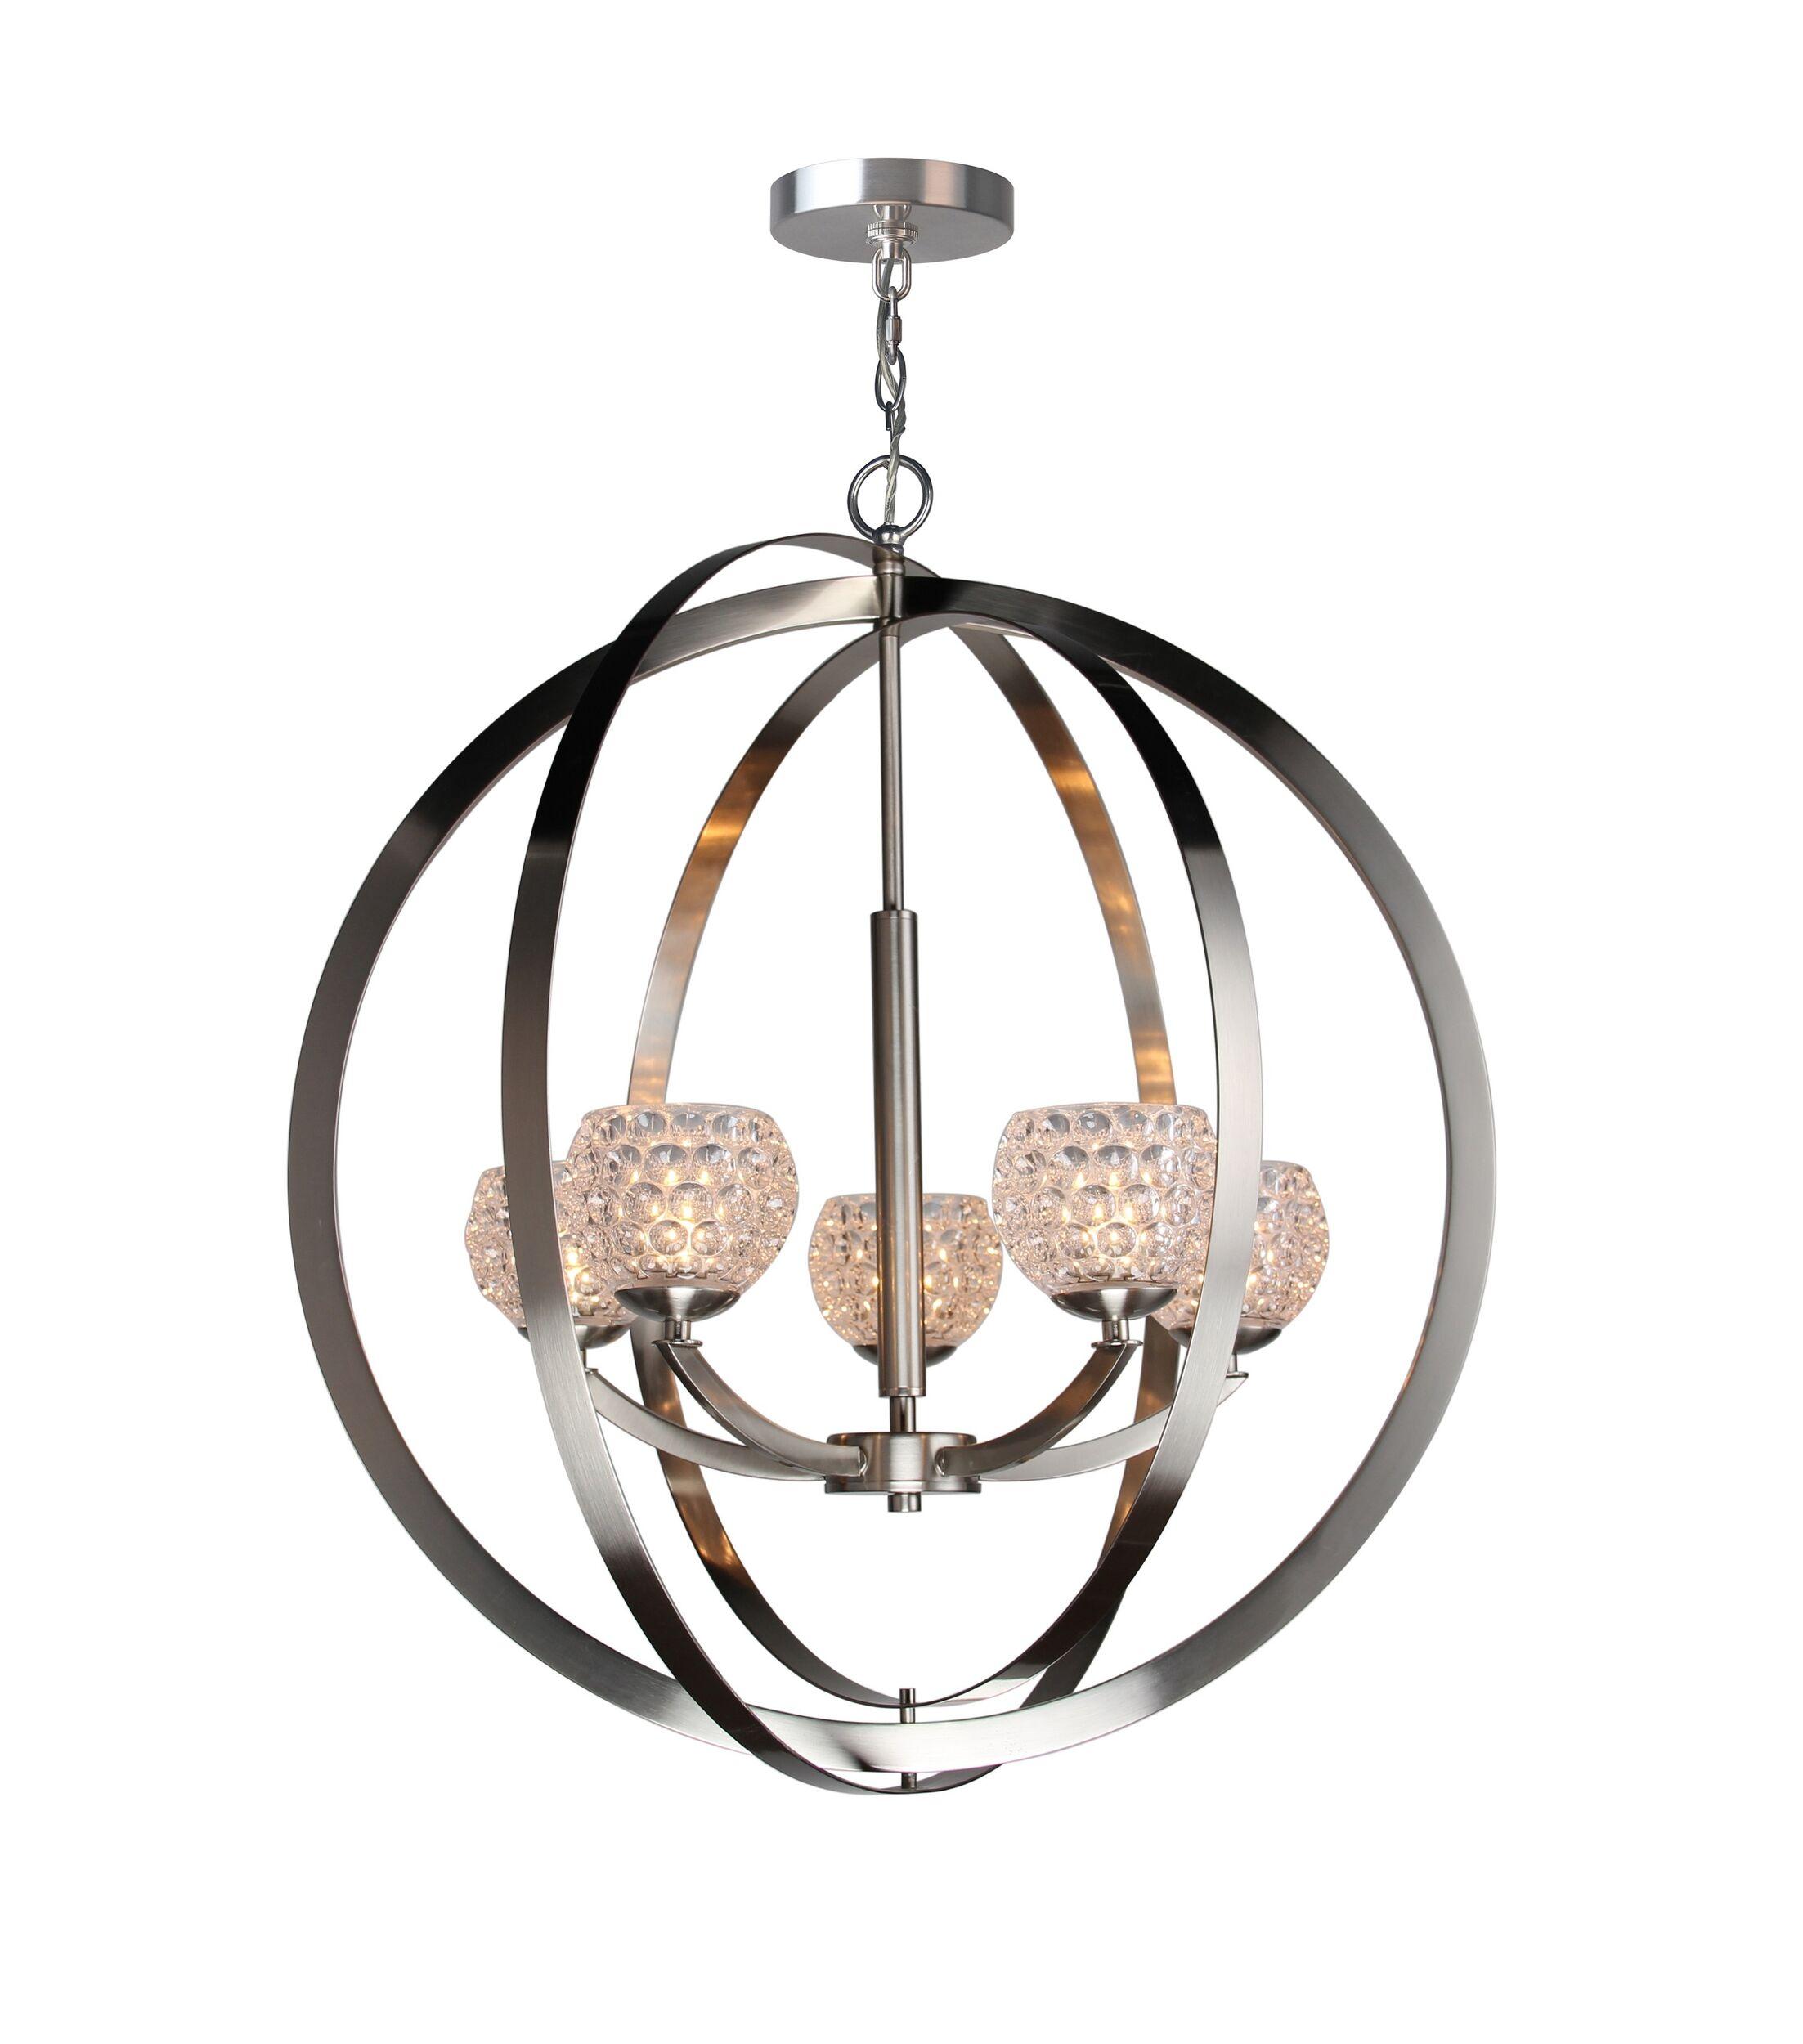 Heavner 5-Light Globe Pendant Shade Color: Clear, Finish: Satin Nickel